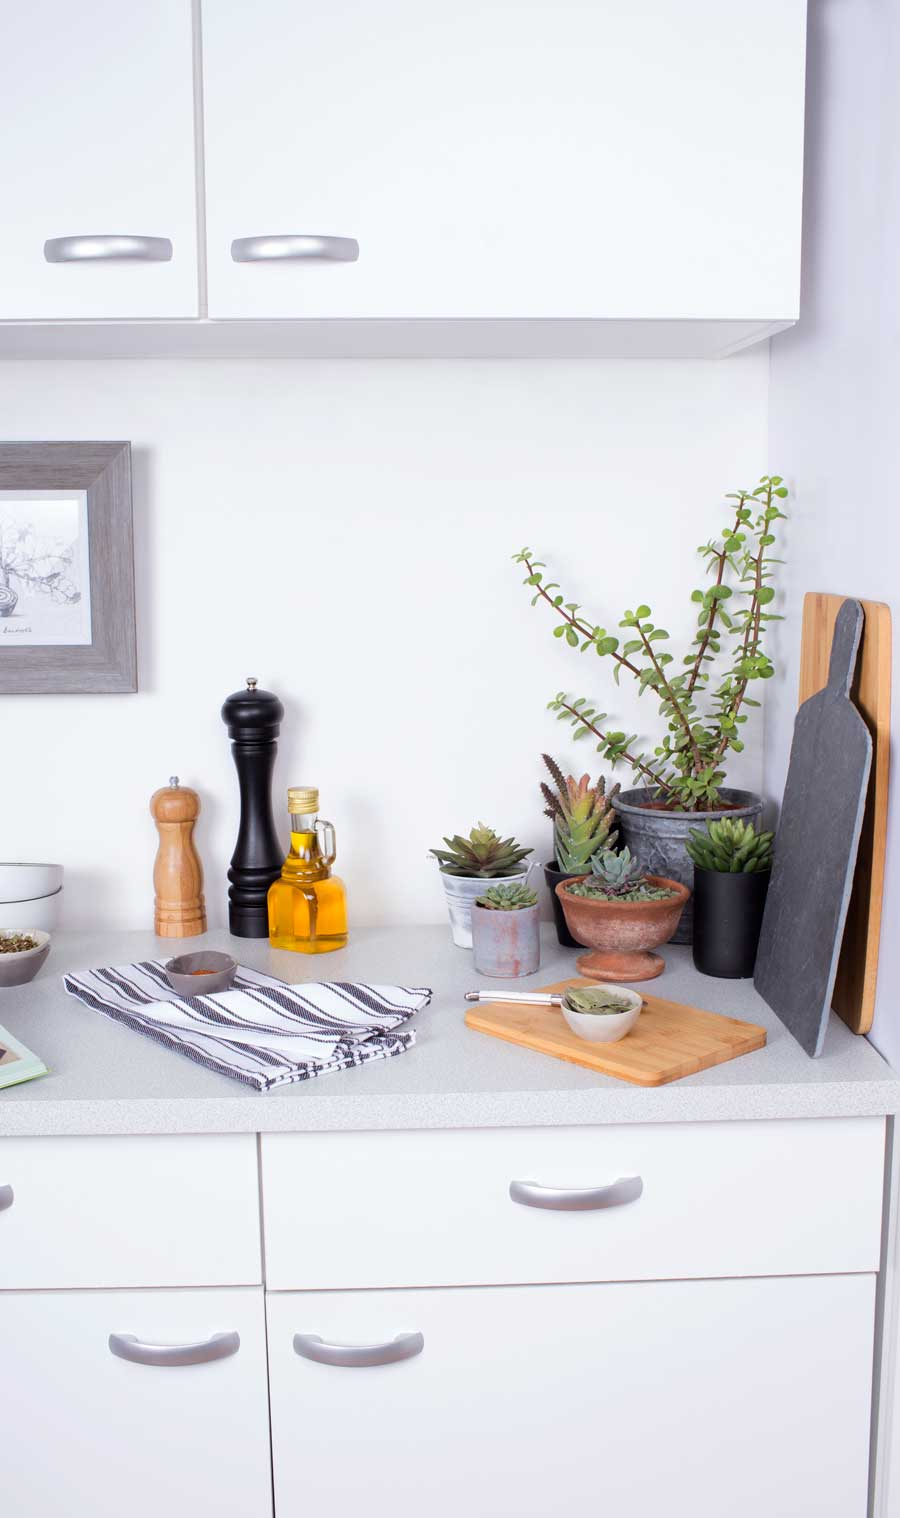 como sobrevivir cocina pequena encimera